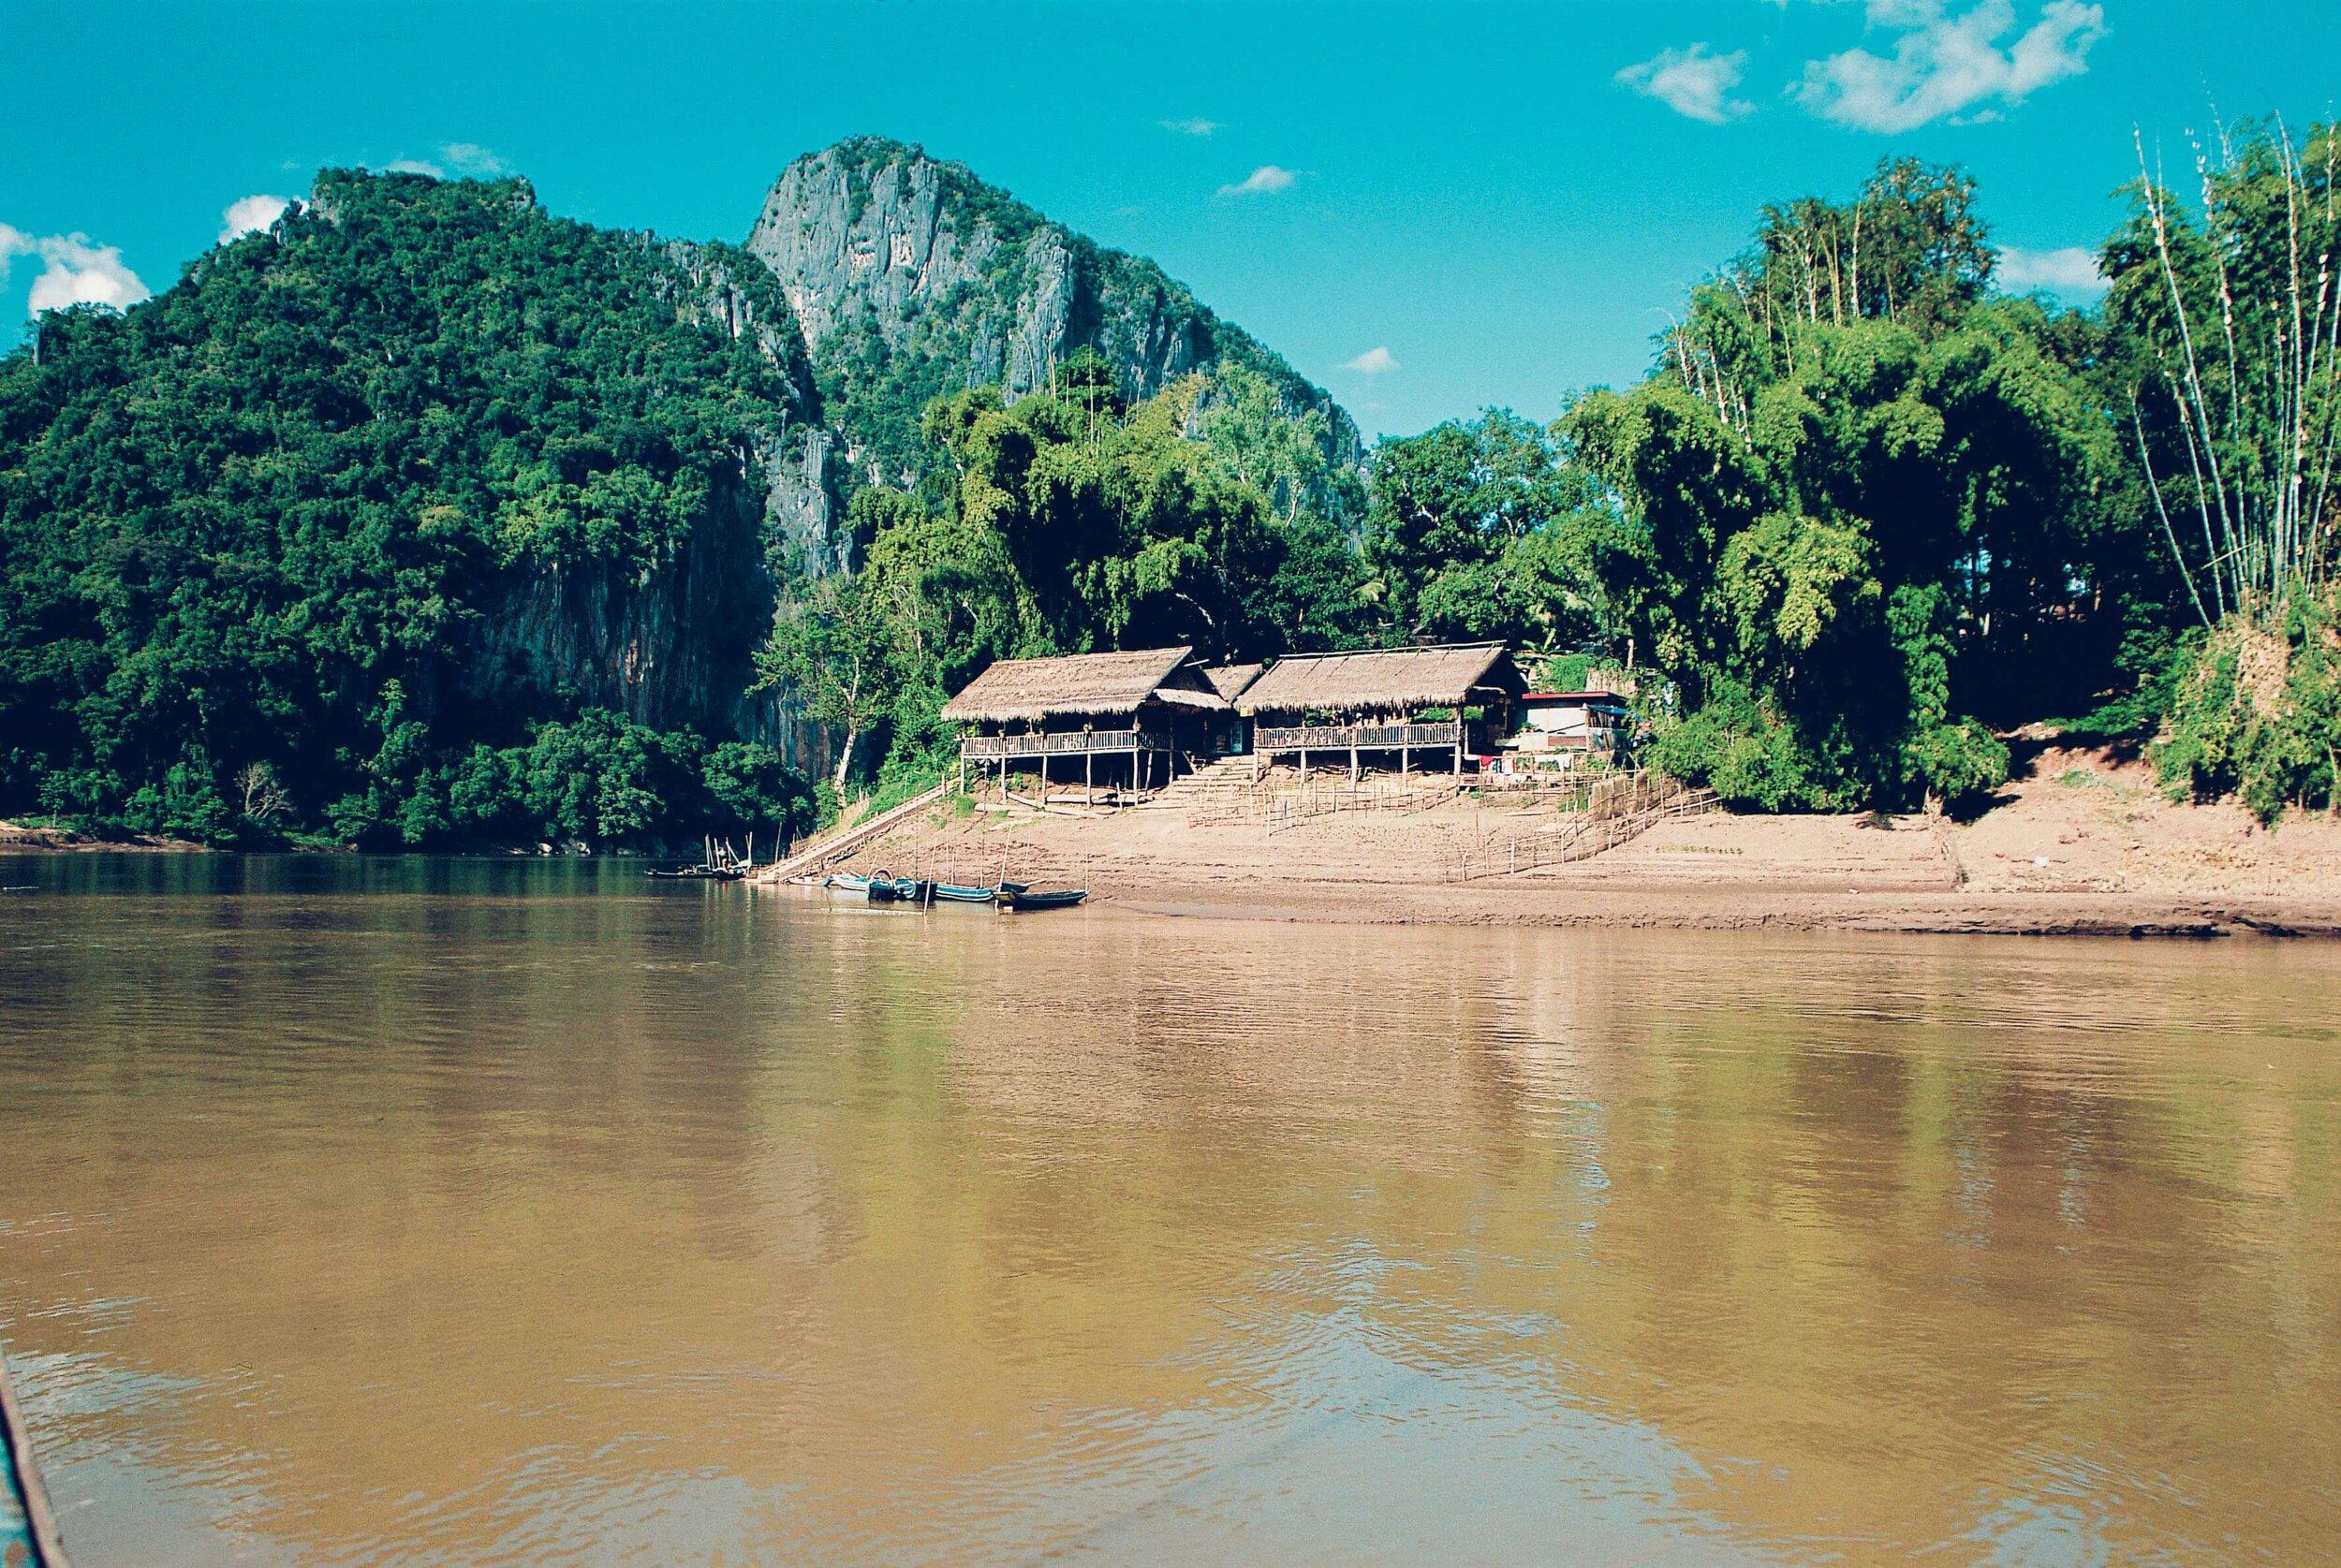 Heritage Line - Laos - Excursion - Local village 3 - LR.jpg